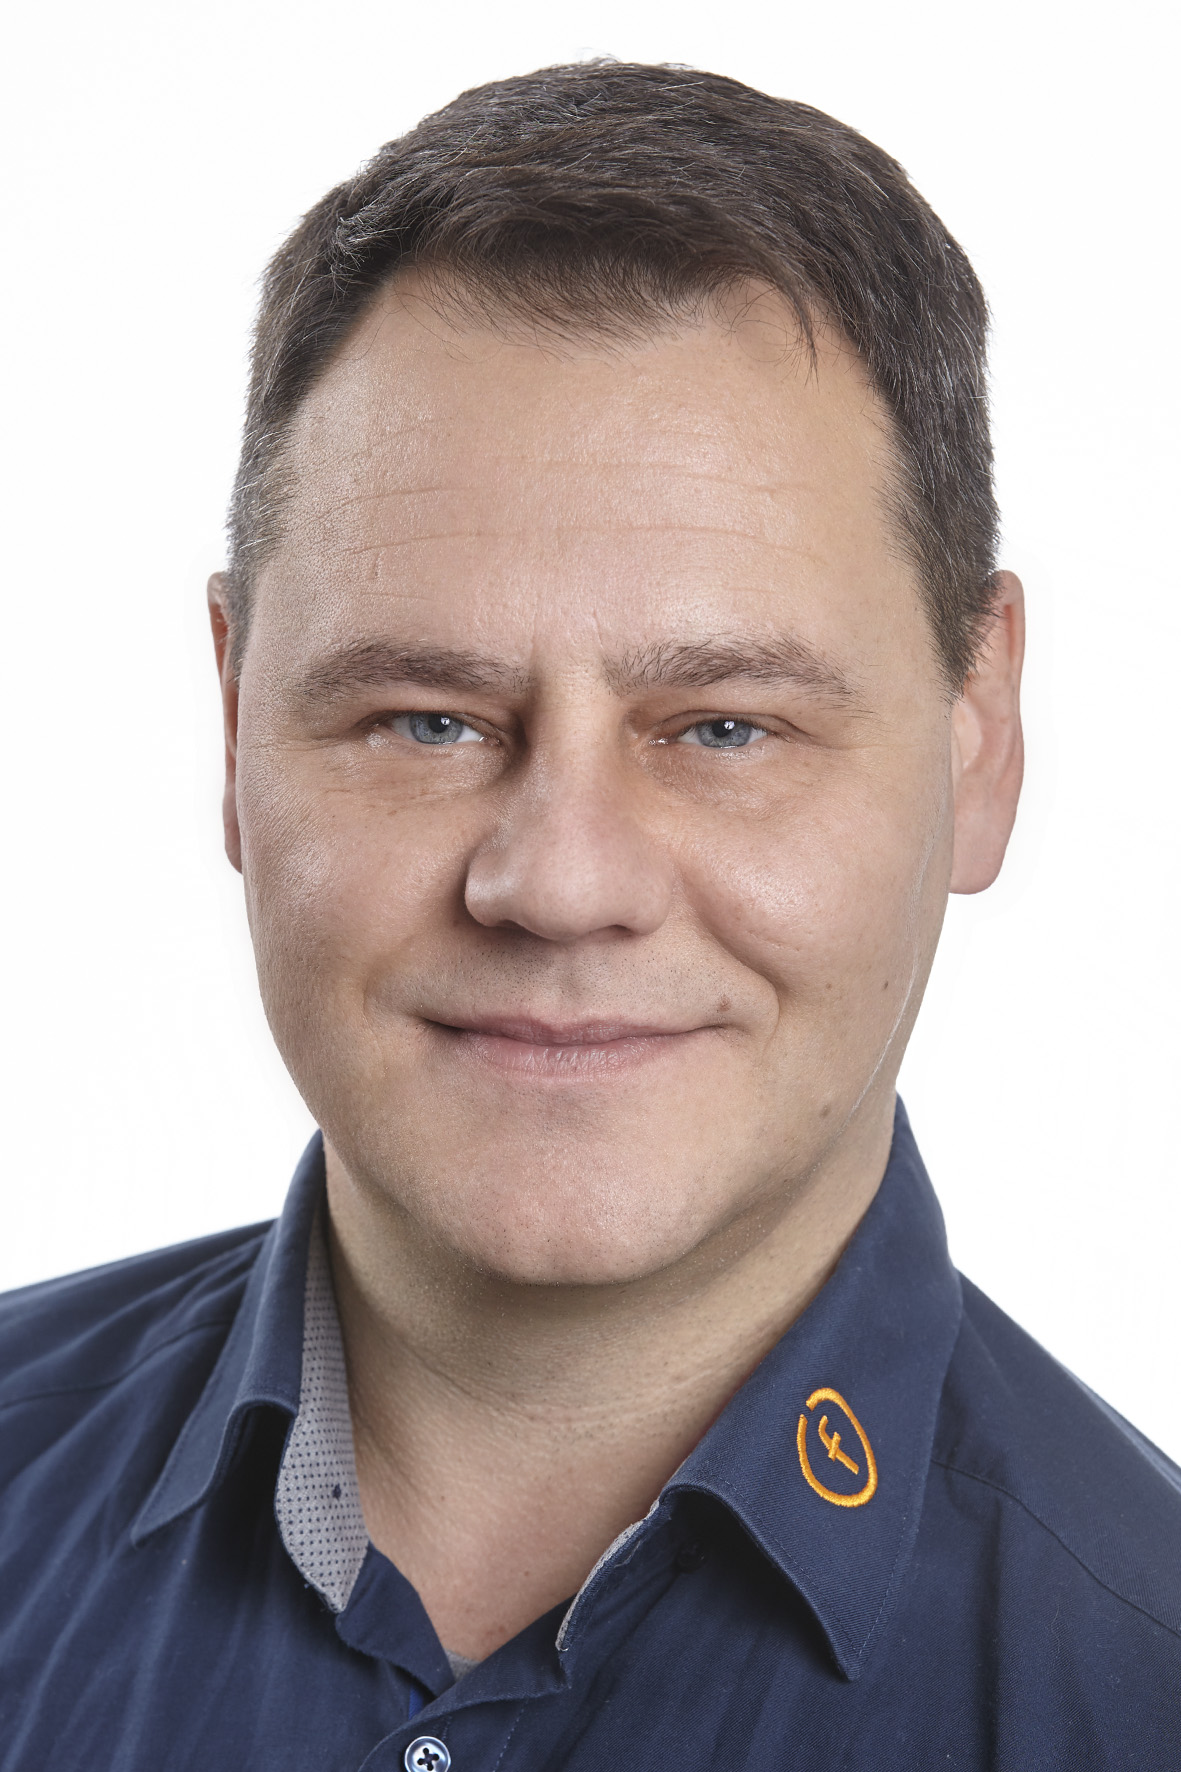 Alexander Eberhard | IT-Consultant | Server, Support